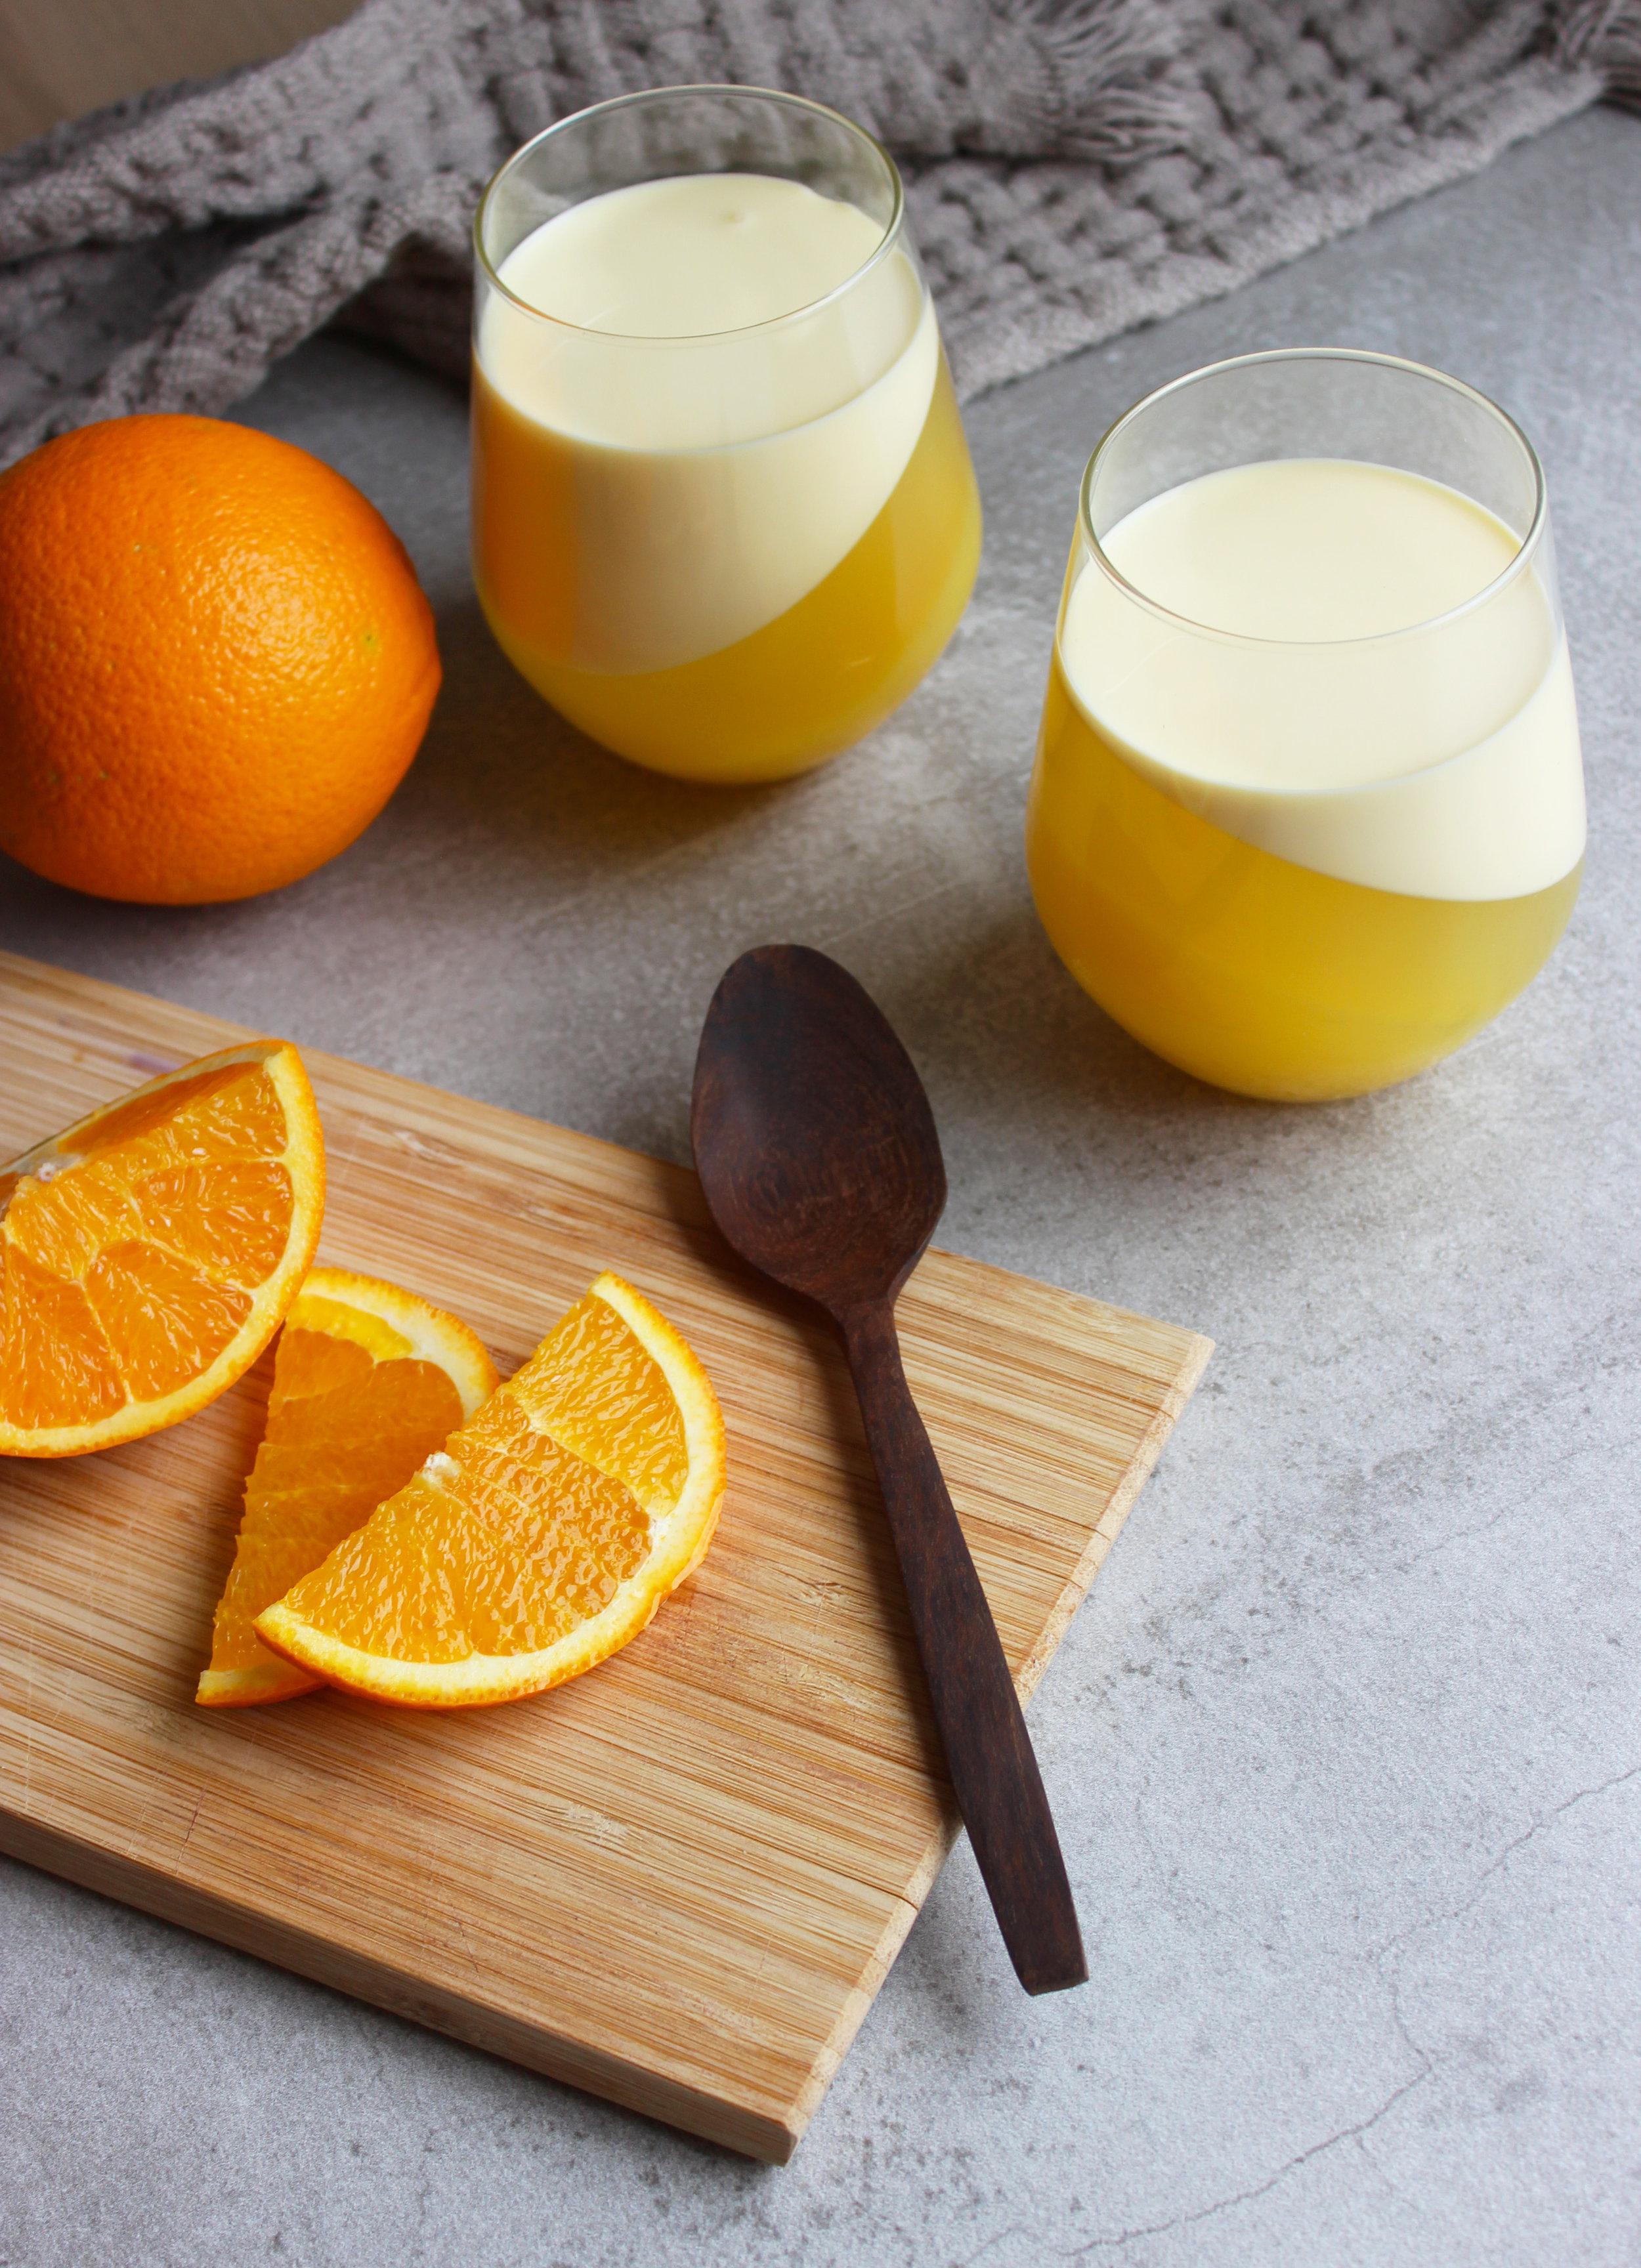 Appelsingele-lerum.jpg